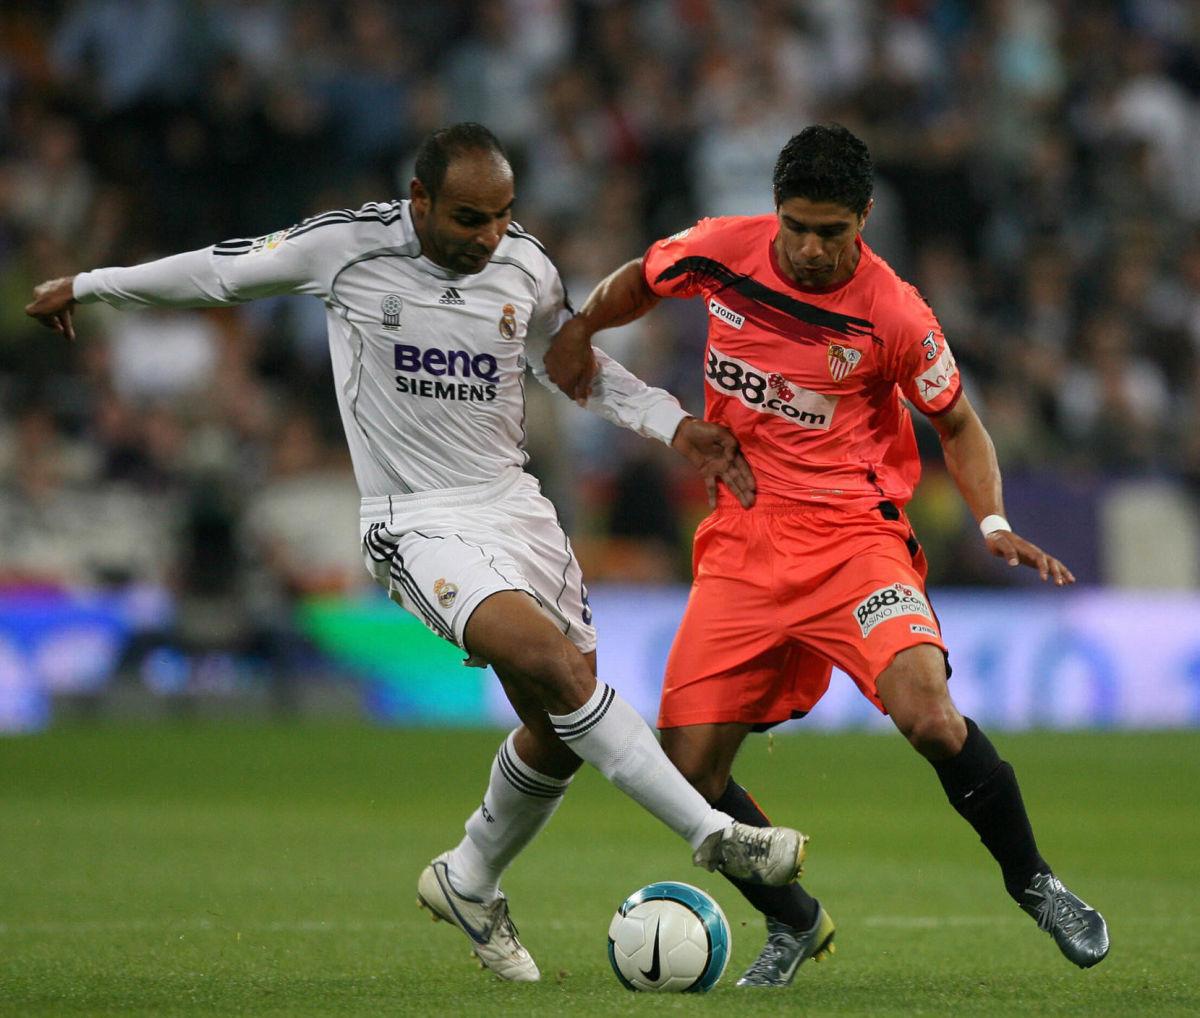 sevilla-s-brazilian-midfielder-renato-r-5d12531d025540793d000001.jpg